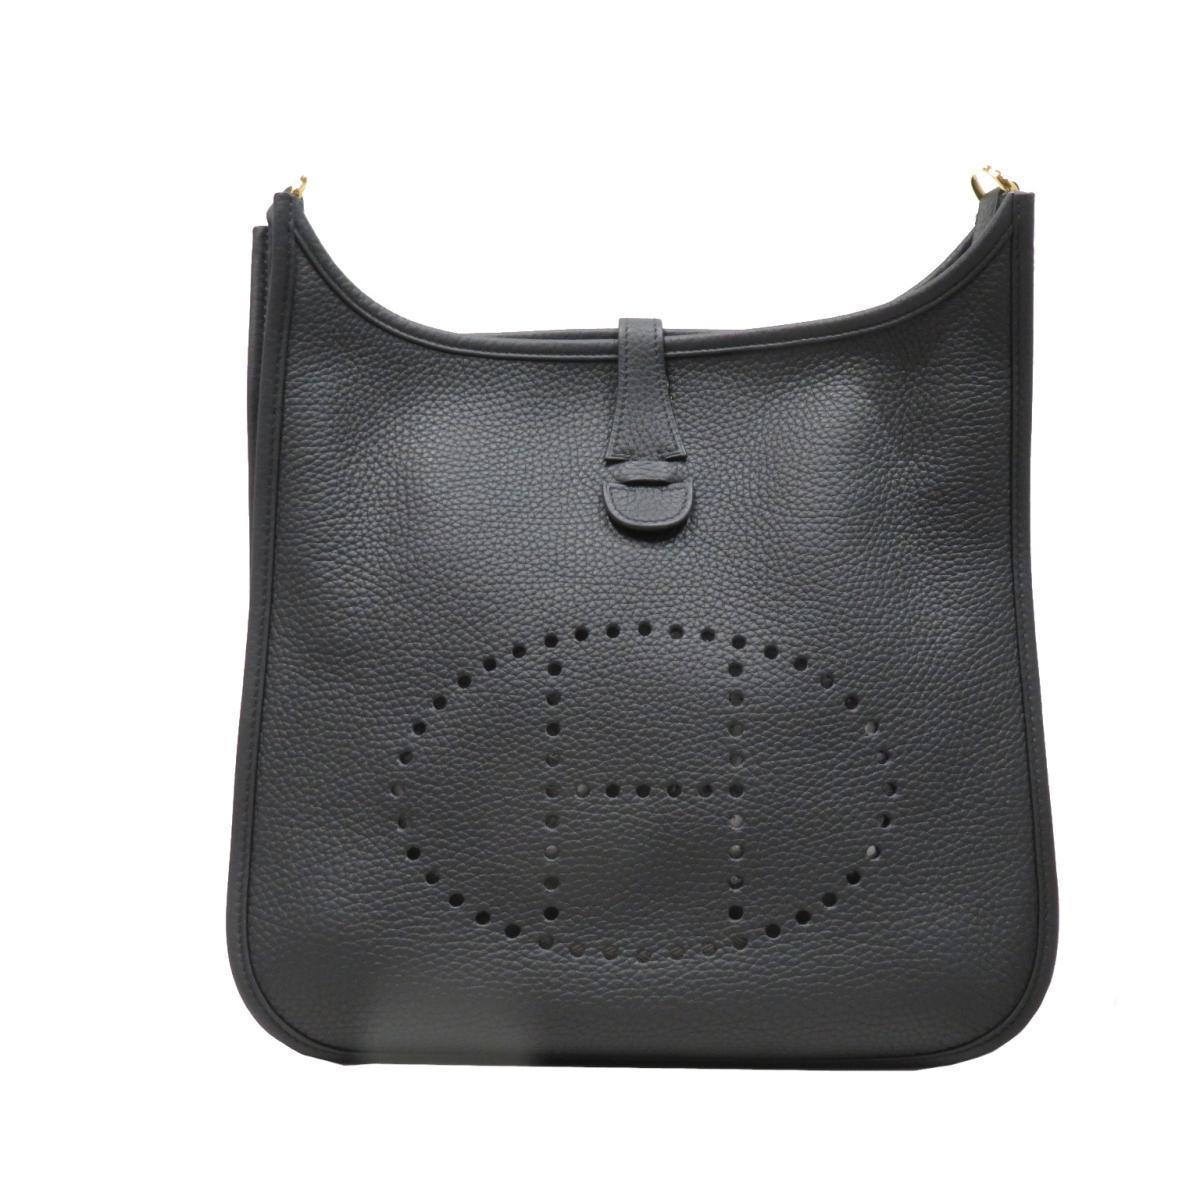 HERMES Evelyn PM Shoulder Bag Ladies Men's Black (Gold Metal Fittings) Taurillon Clemence